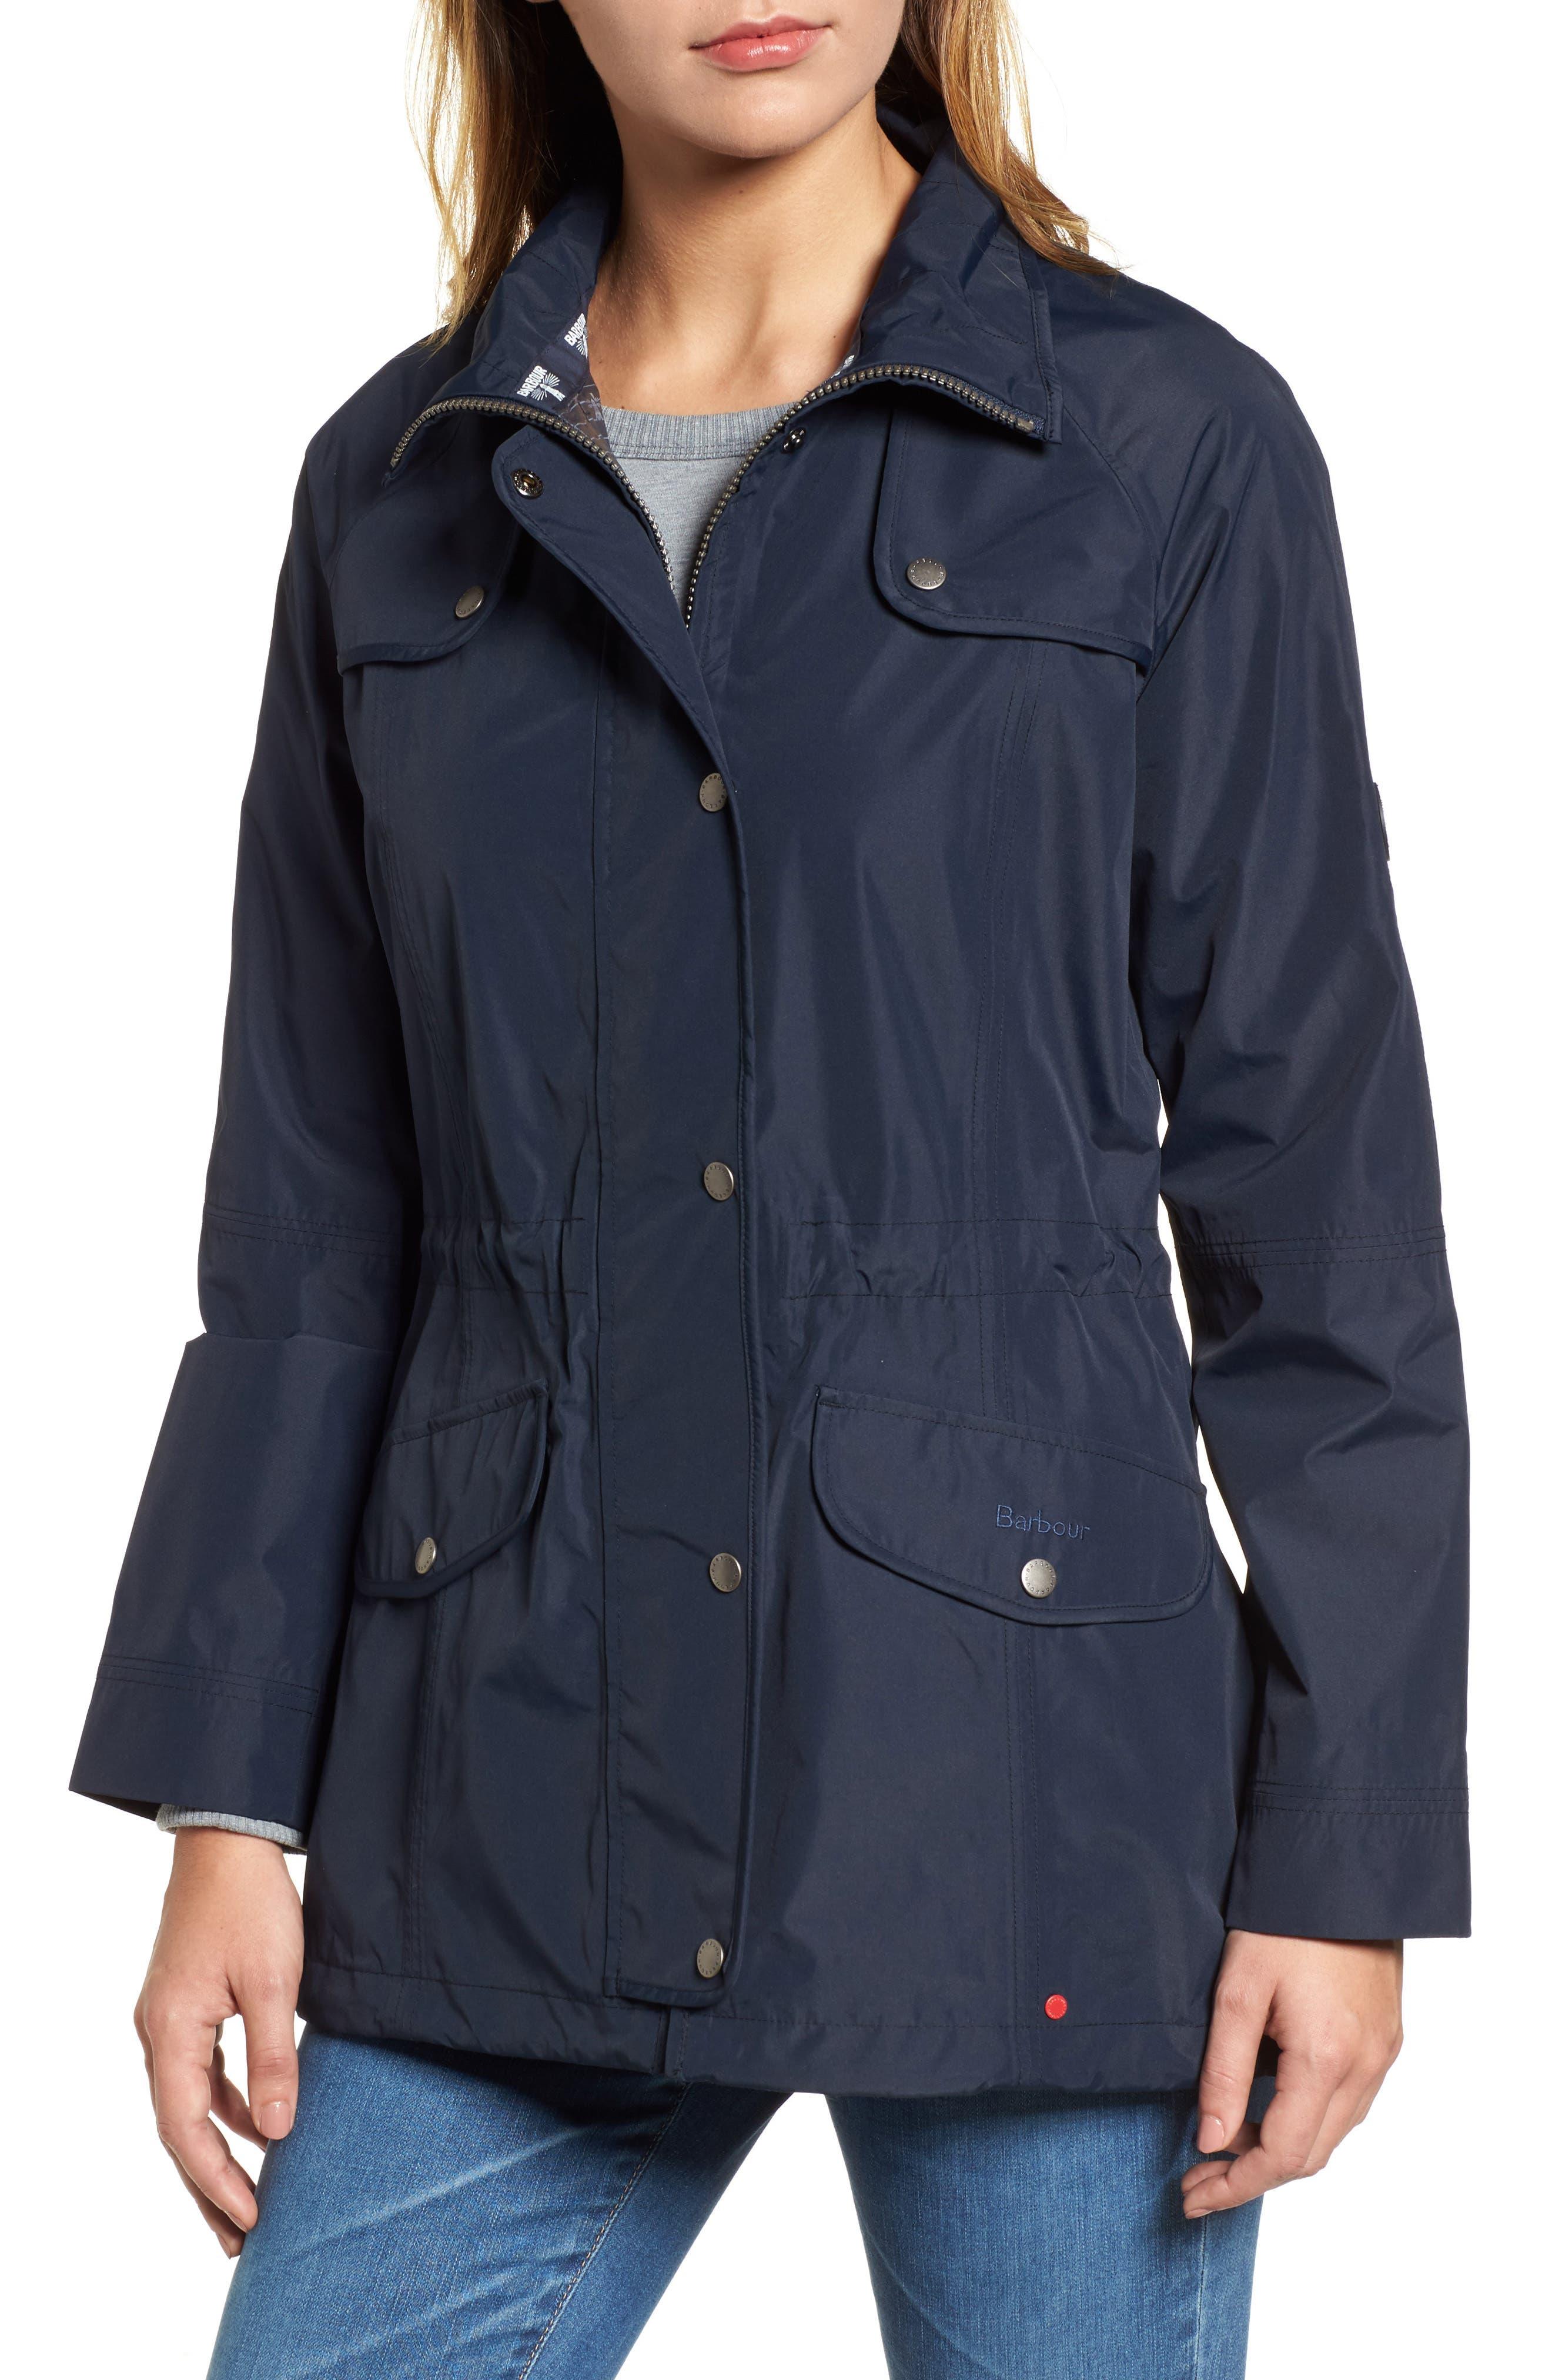 Trevose Hooded Jacket,                             Alternate thumbnail 4, color,                             Navy